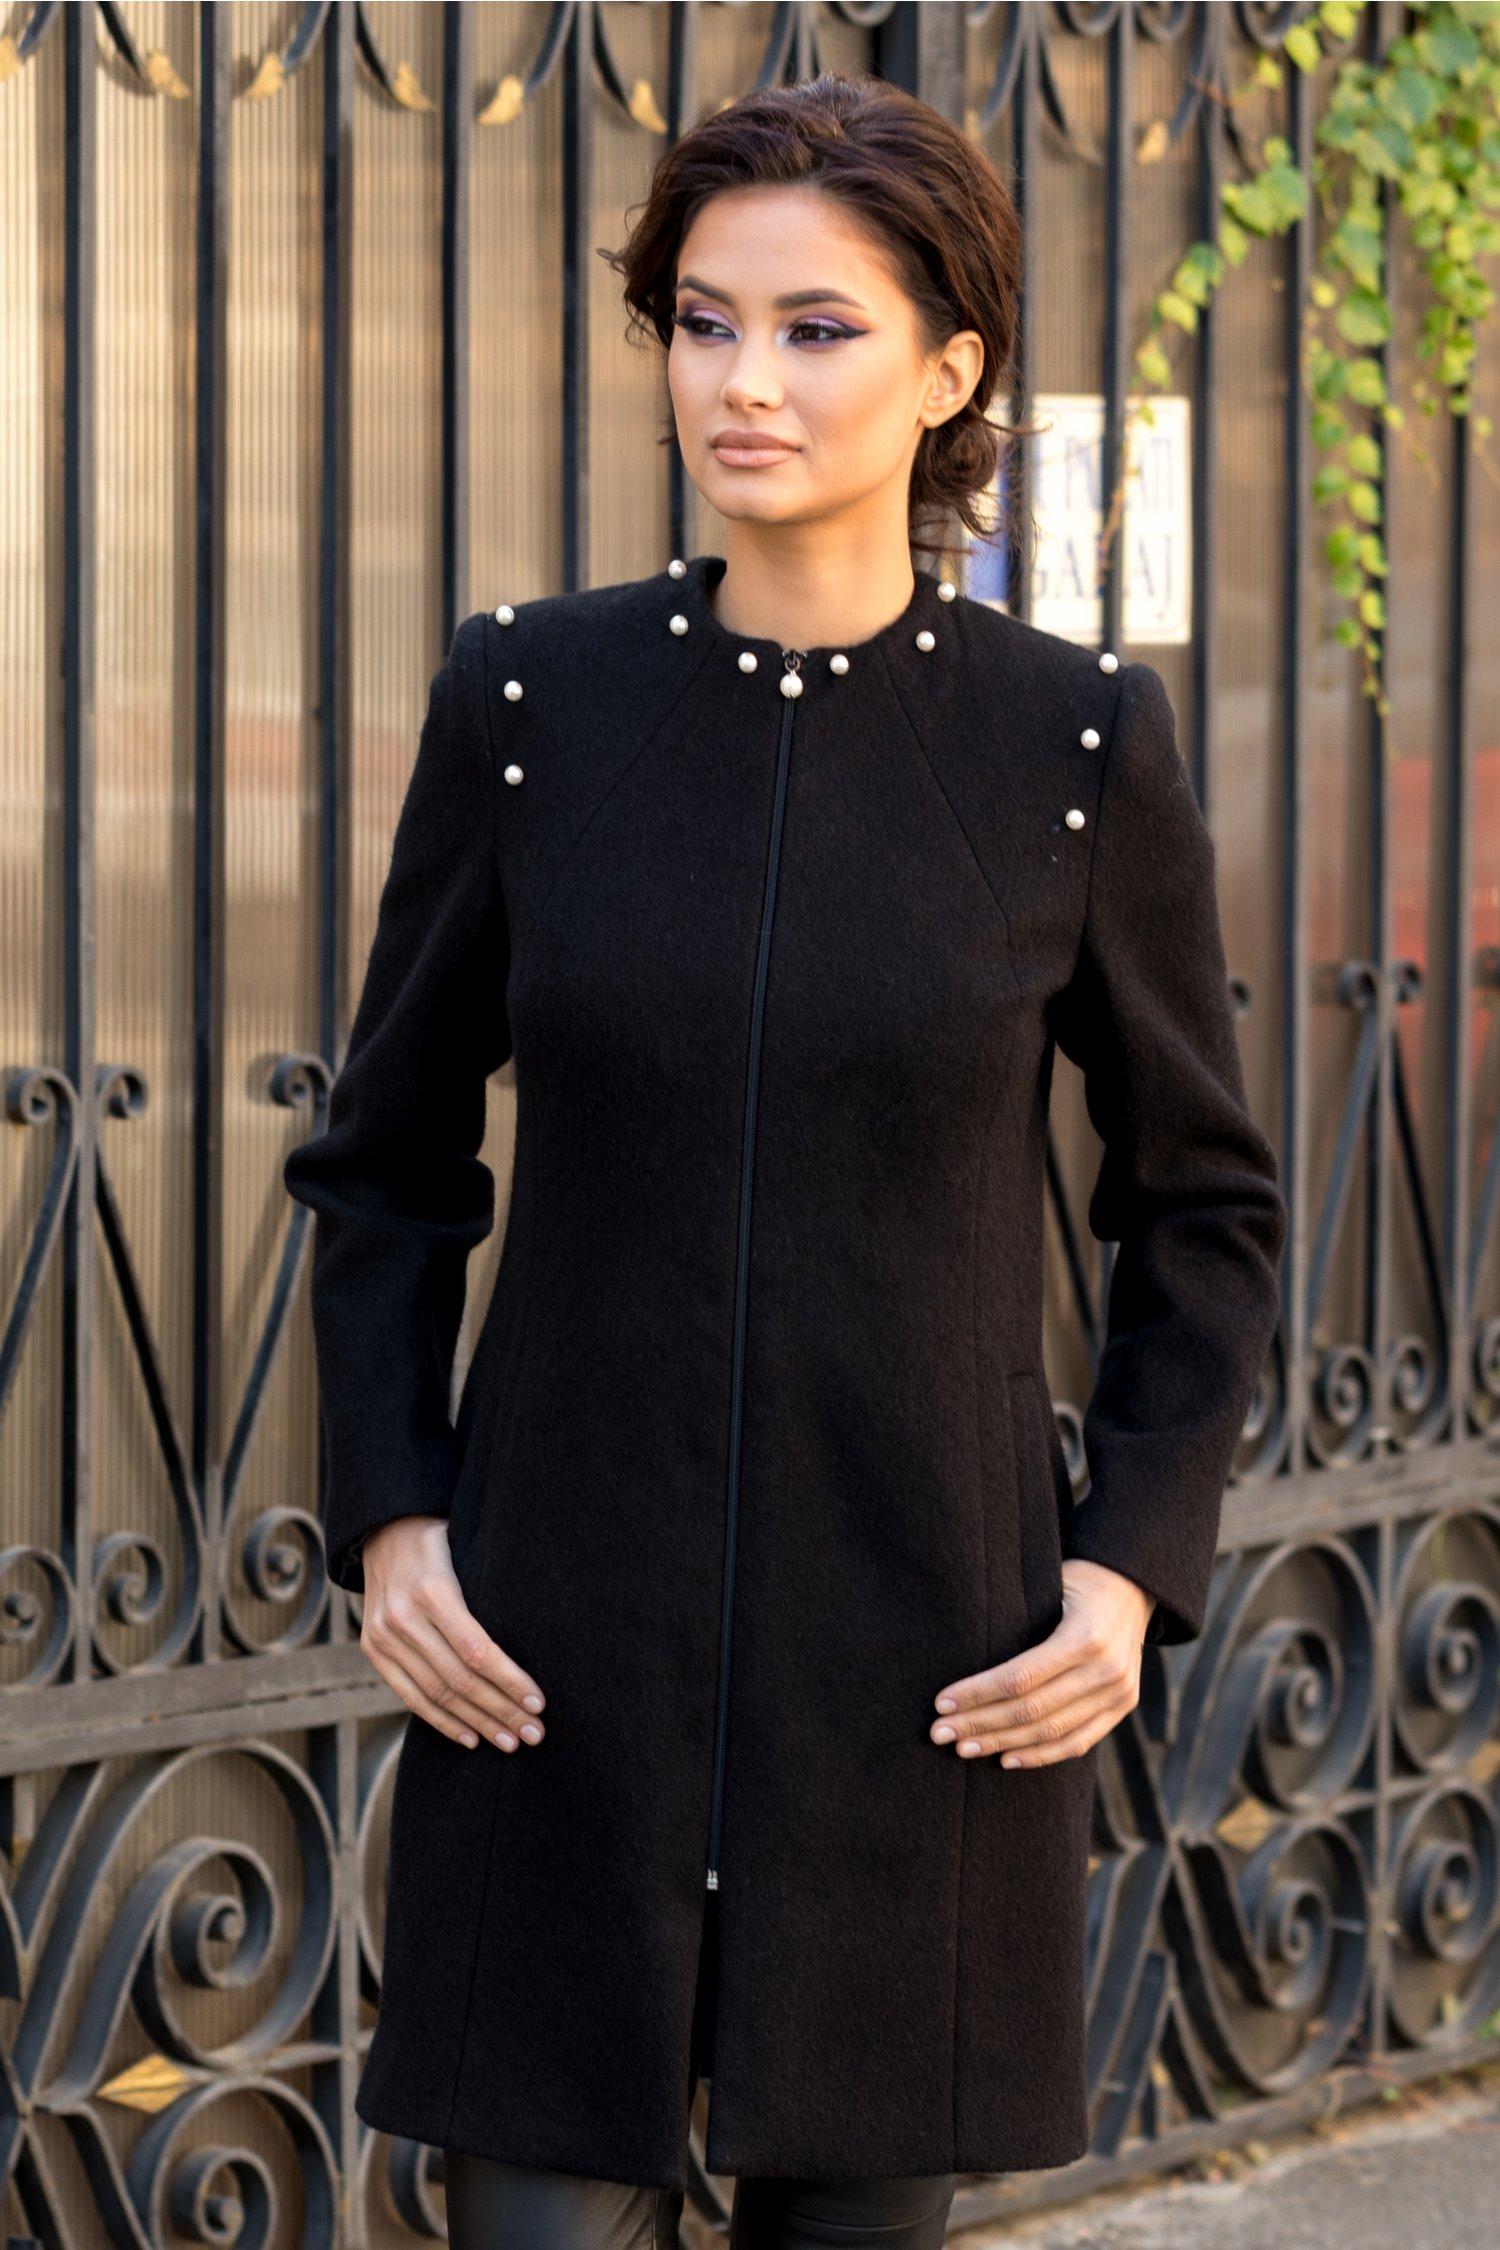 Palton negru din lana cu perle aplicate